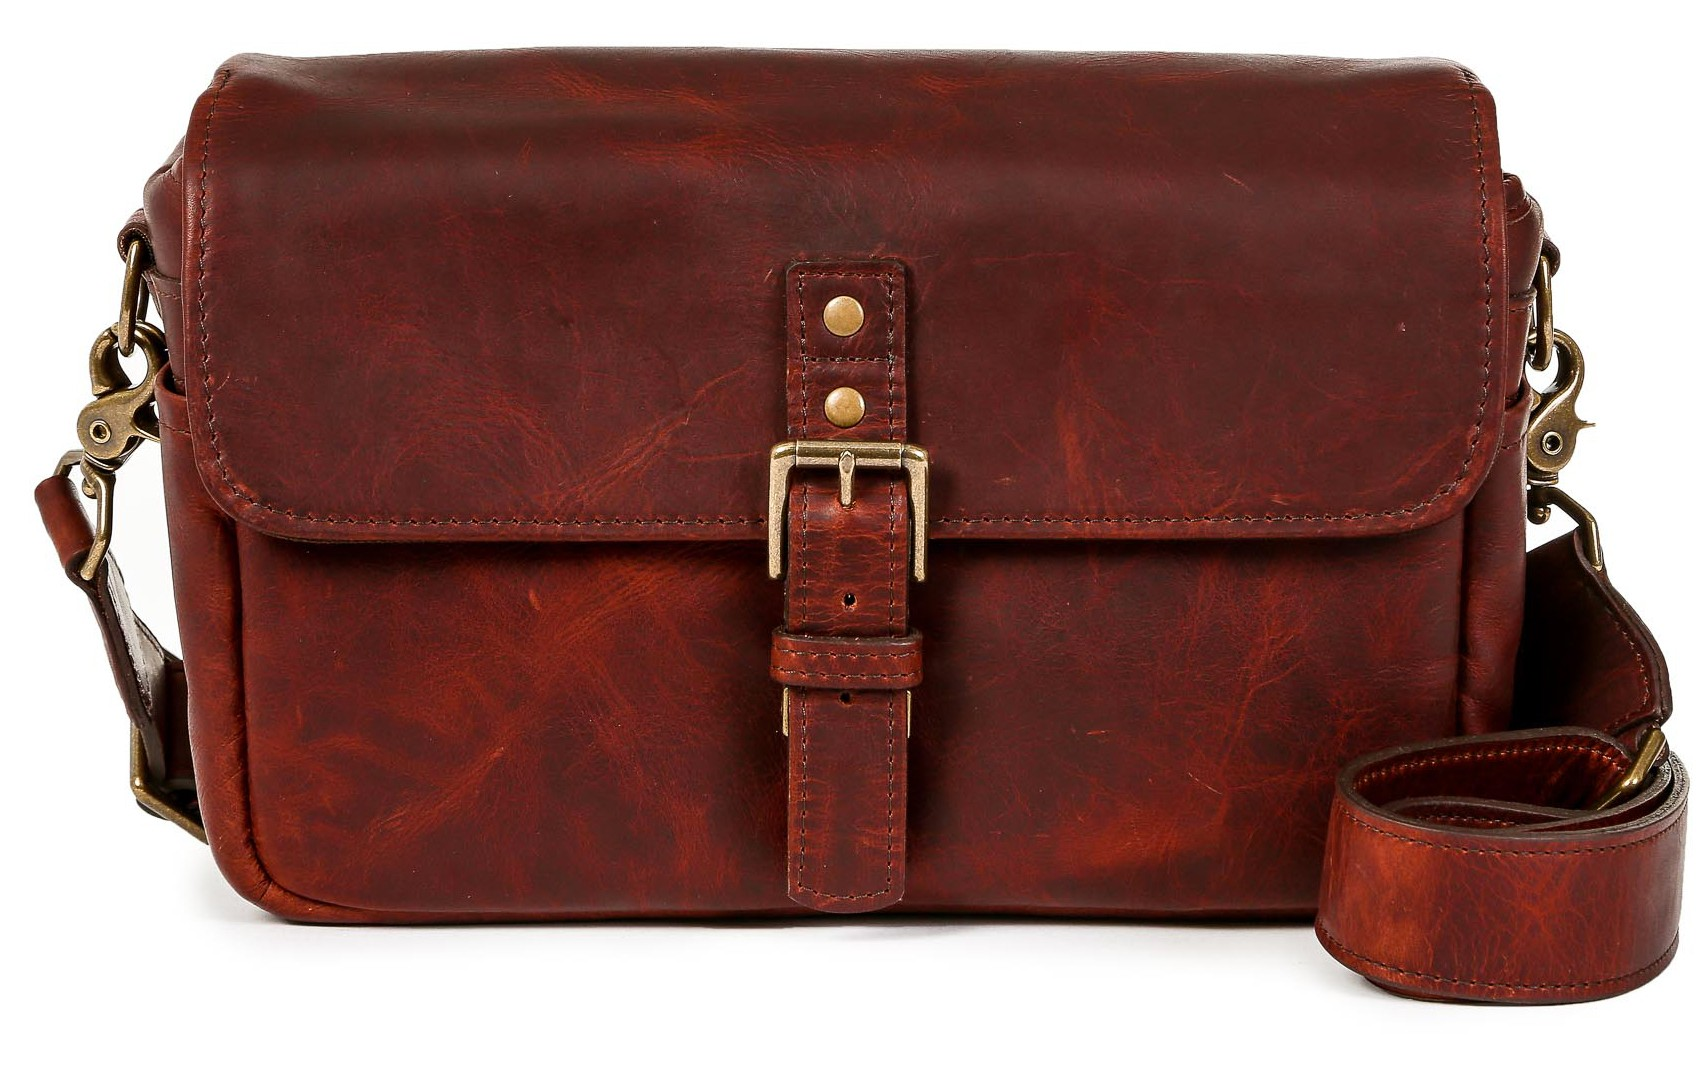 ONA Bags Bowery Bordeaux